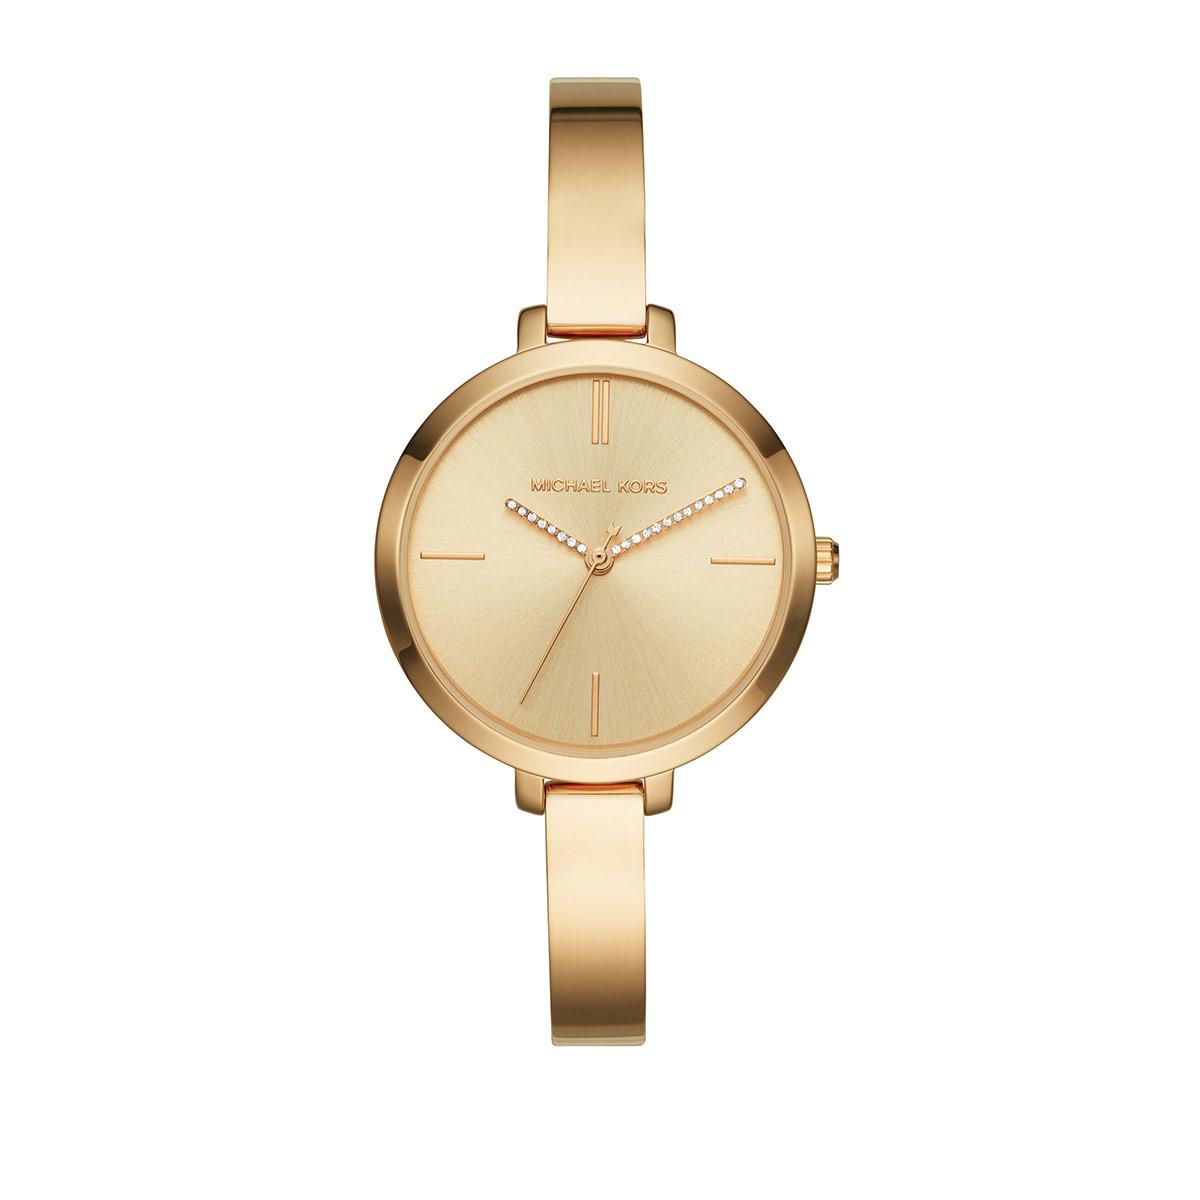 RtZi6ZjQNO Horloges - Ladies Jaryn Narrow Strap kCs4rQg8k7 goud in goud voor dames Uitlaat Gratis Verzending Authentieke PQyPLL